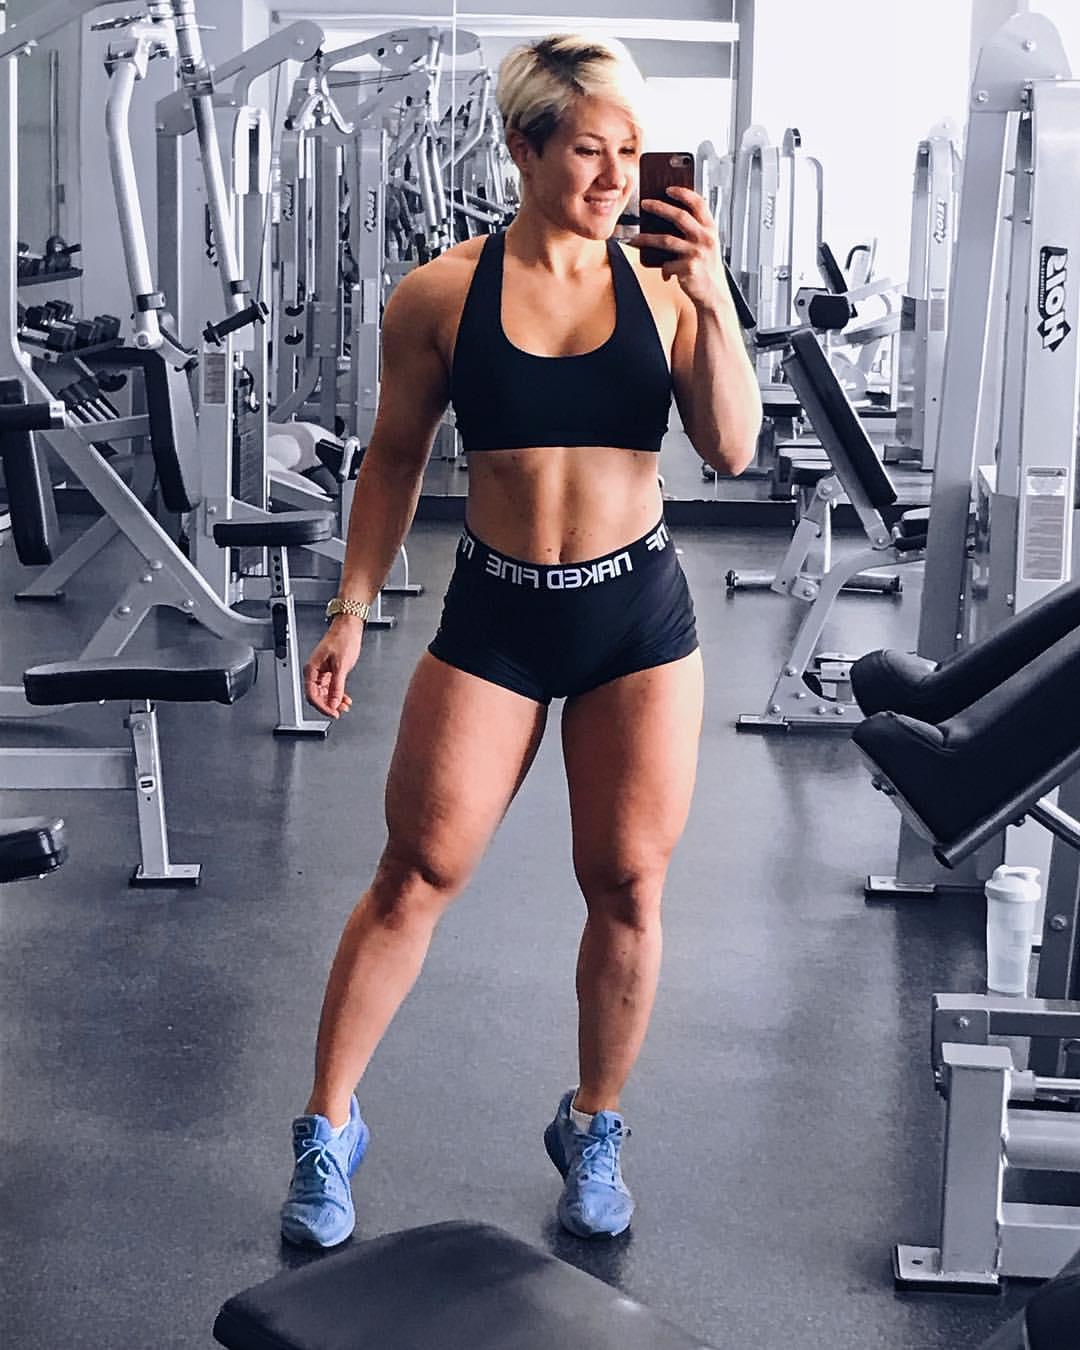 Fitnish.com interview With Chicago Personal Trainer, Elena Soboleva